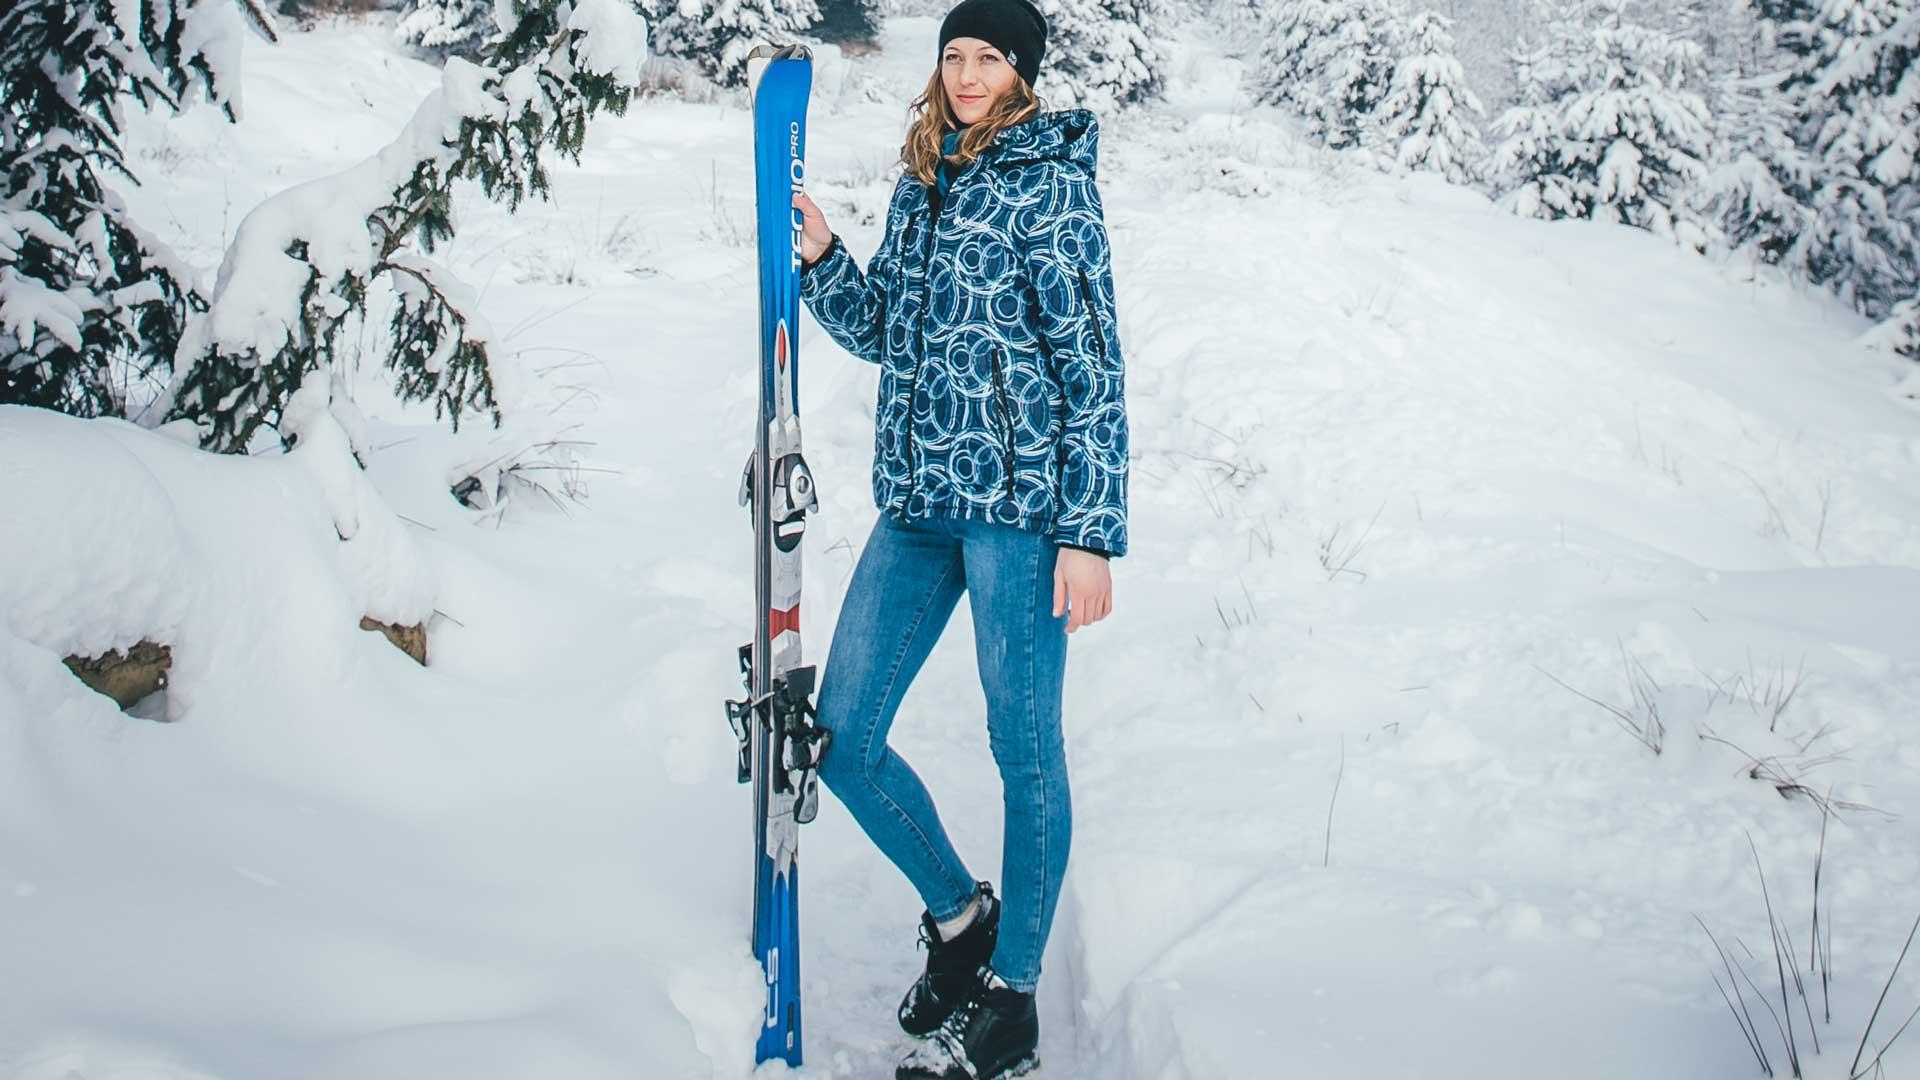 Women's-Ski-Pantson-on-DailymirrorToday